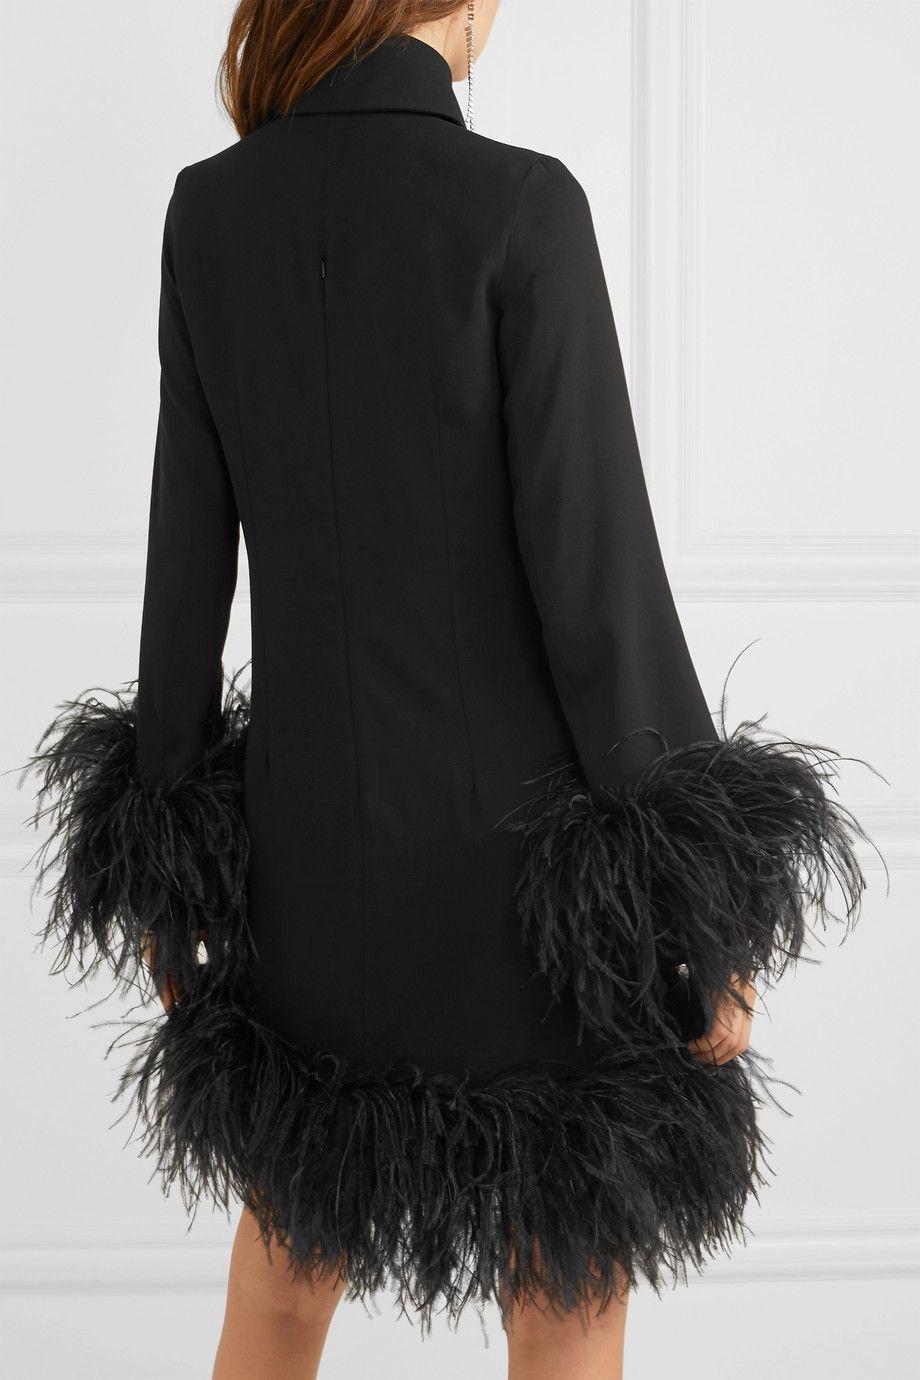 16arlington Michelle Feather Trimmed Mini Dress Net A Porter Com Dresses Mini Dress Mini Black Dress [ 1380 x 920 Pixel ]